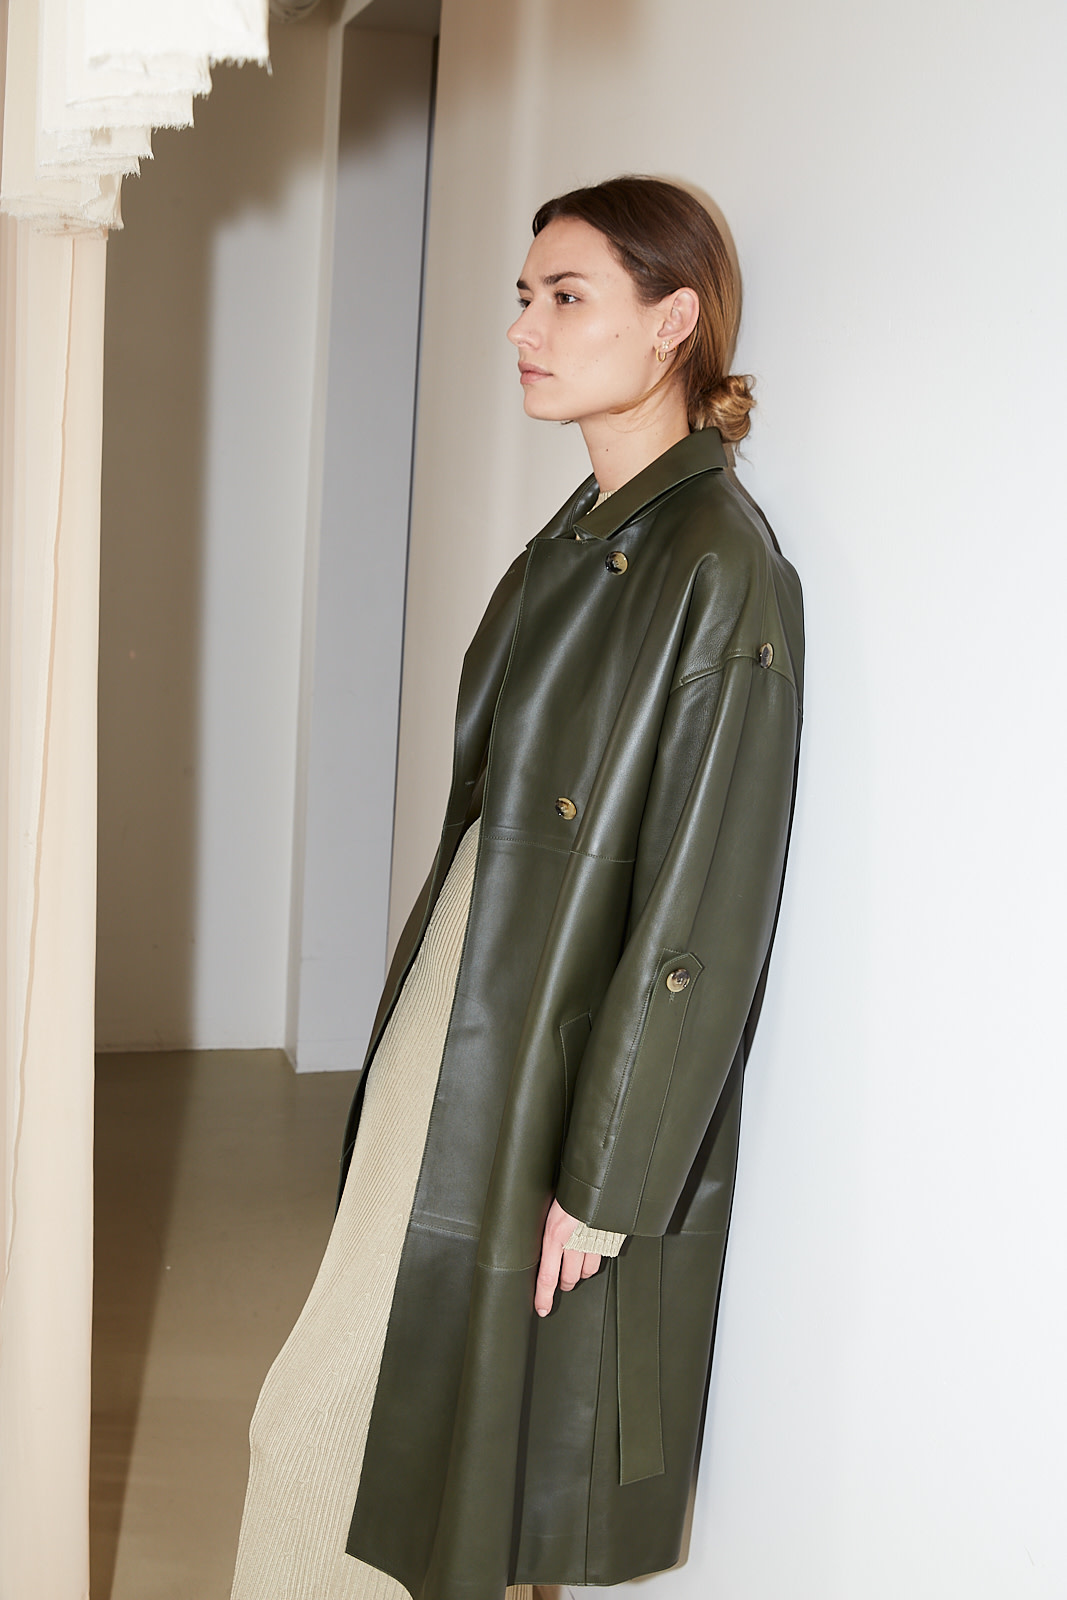 Aeron Palla leather coat